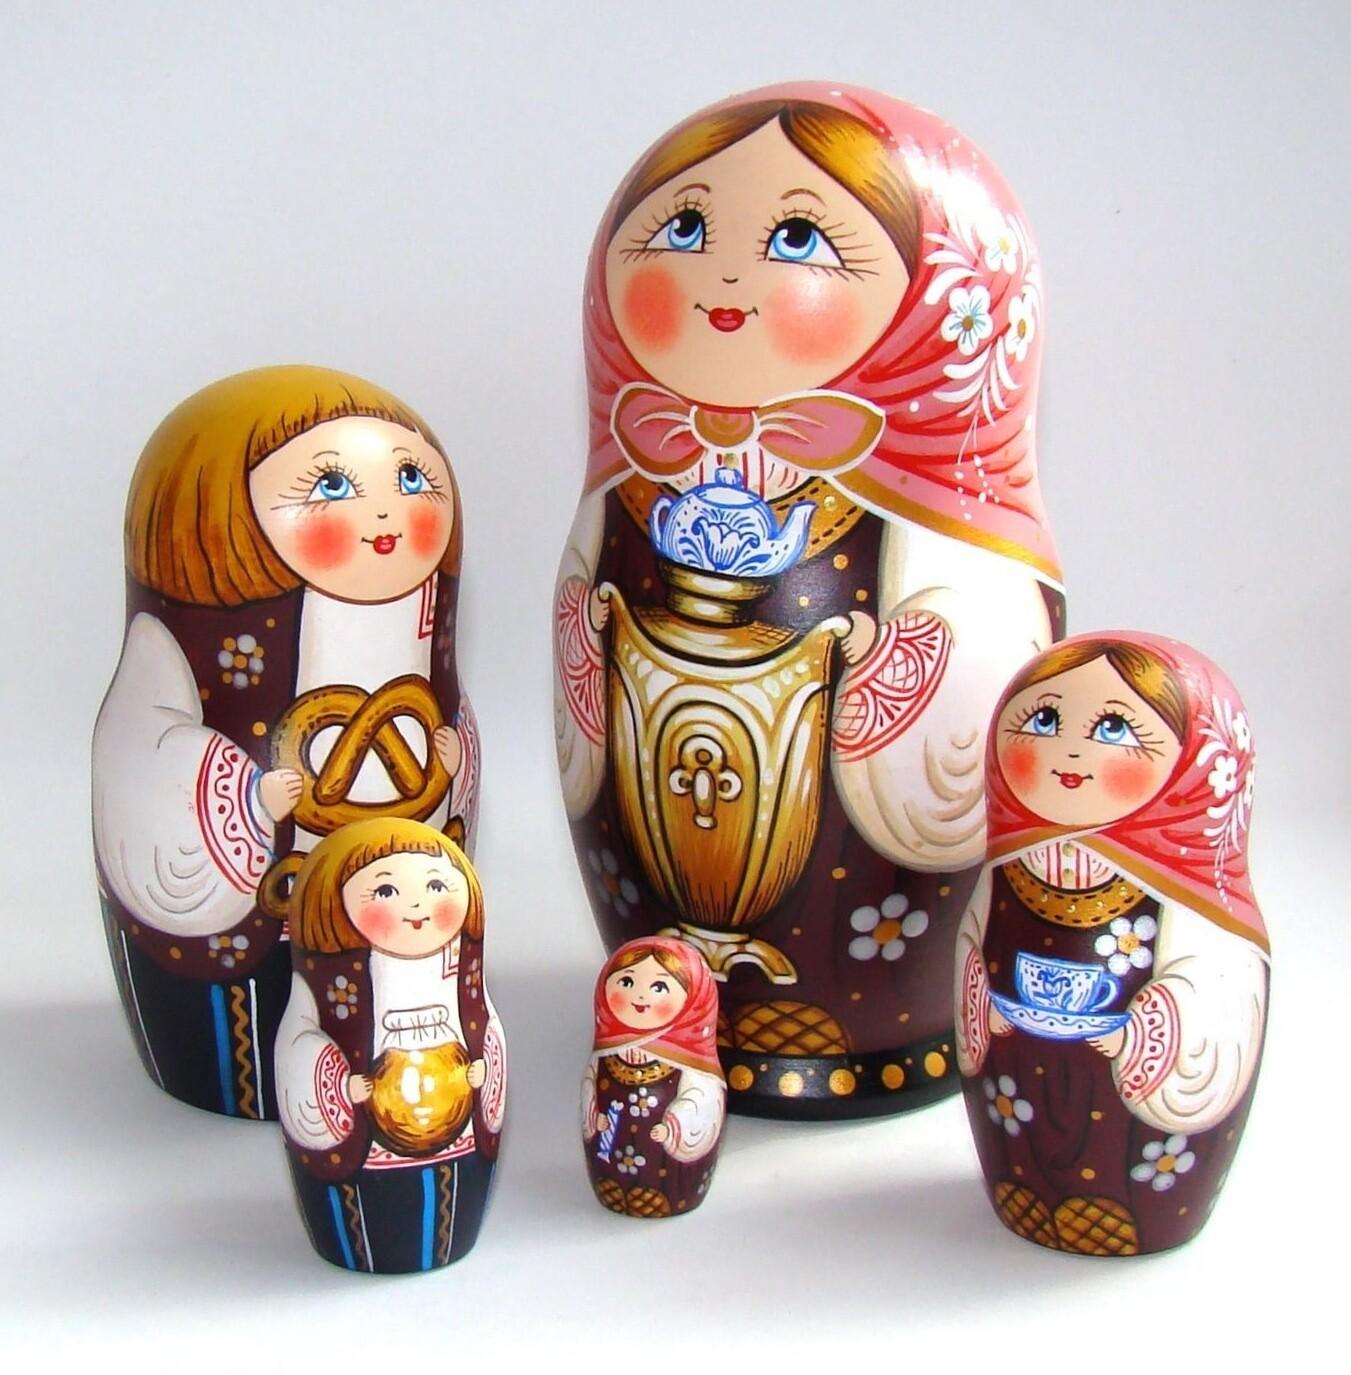 Матрёшка авторская «Маруся с самоваром» 5 кукол